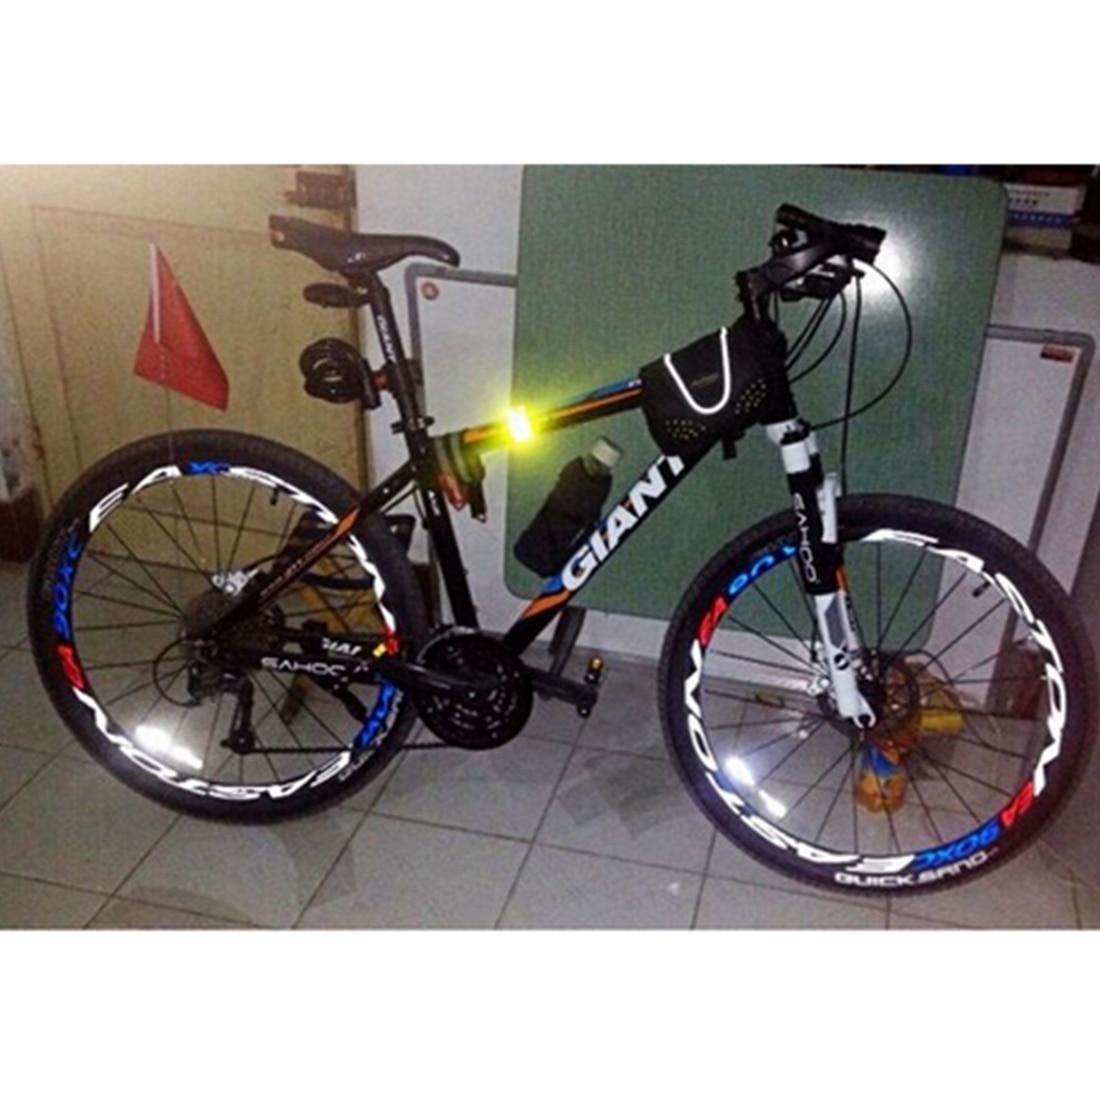 Race Face Next SL Crank Decals Set Sticker Mountain Bike Adhesive Dark Blue 2Pcs